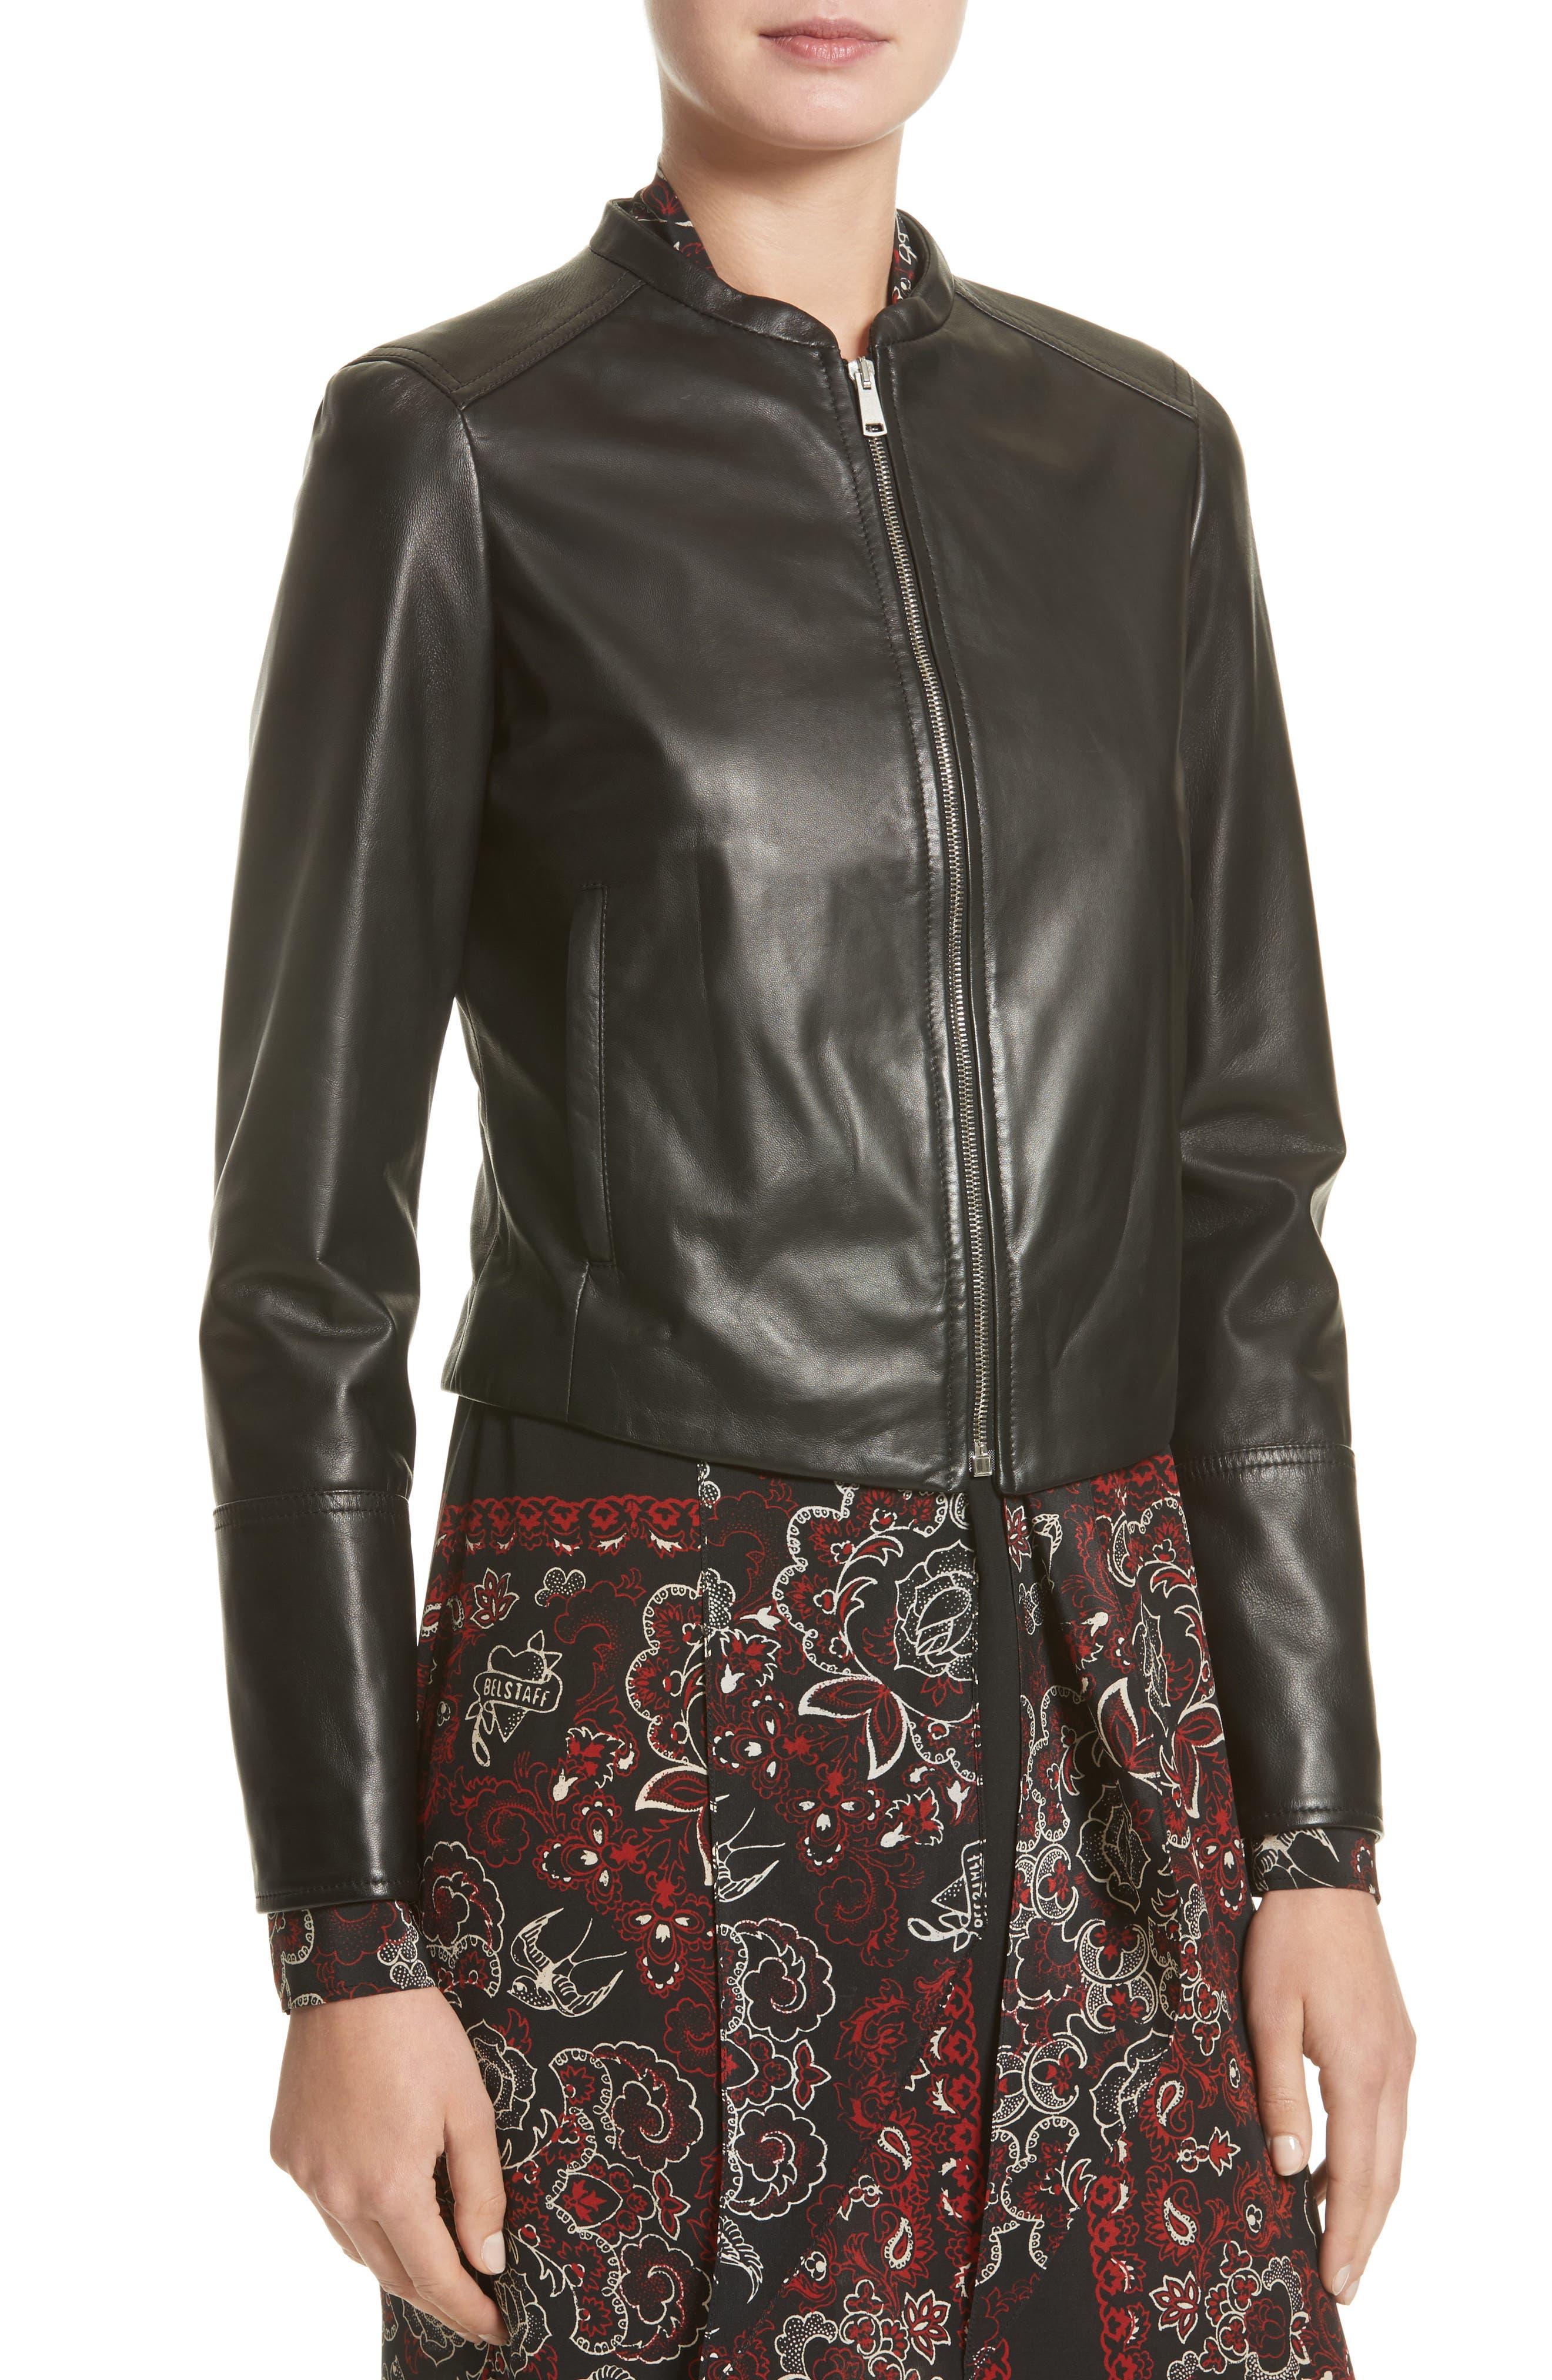 Carrack Leather Jacket,                             Alternate thumbnail 4, color,                             001